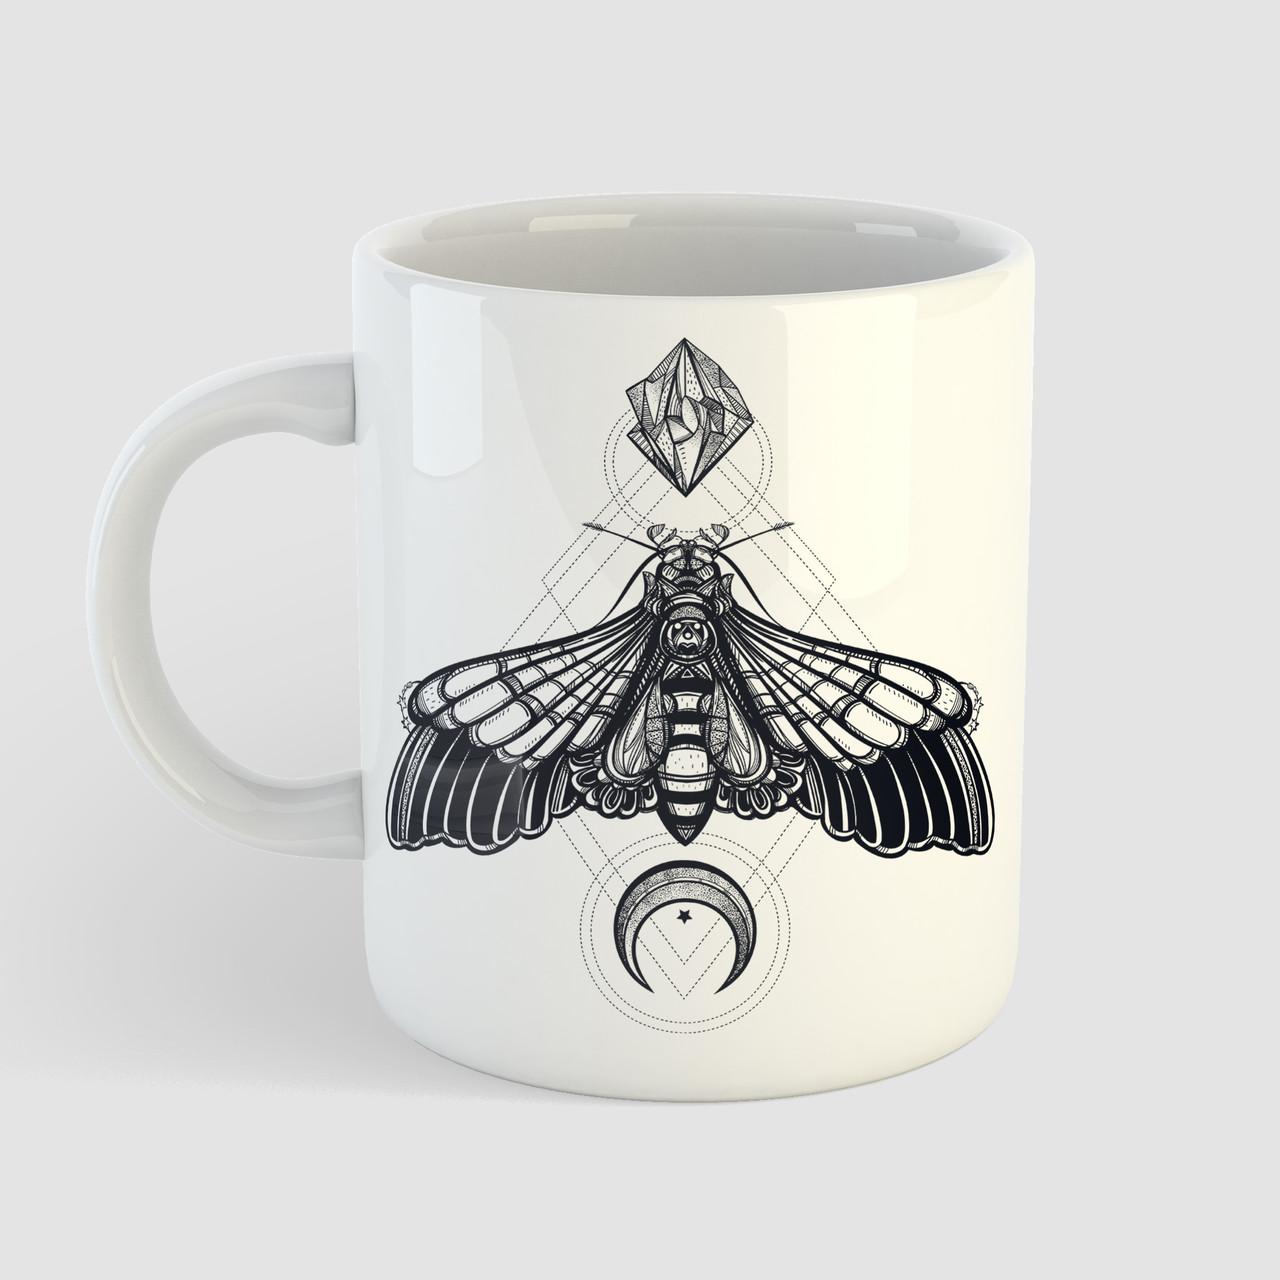 Чашка з принтом Метелик. Чашка з фото